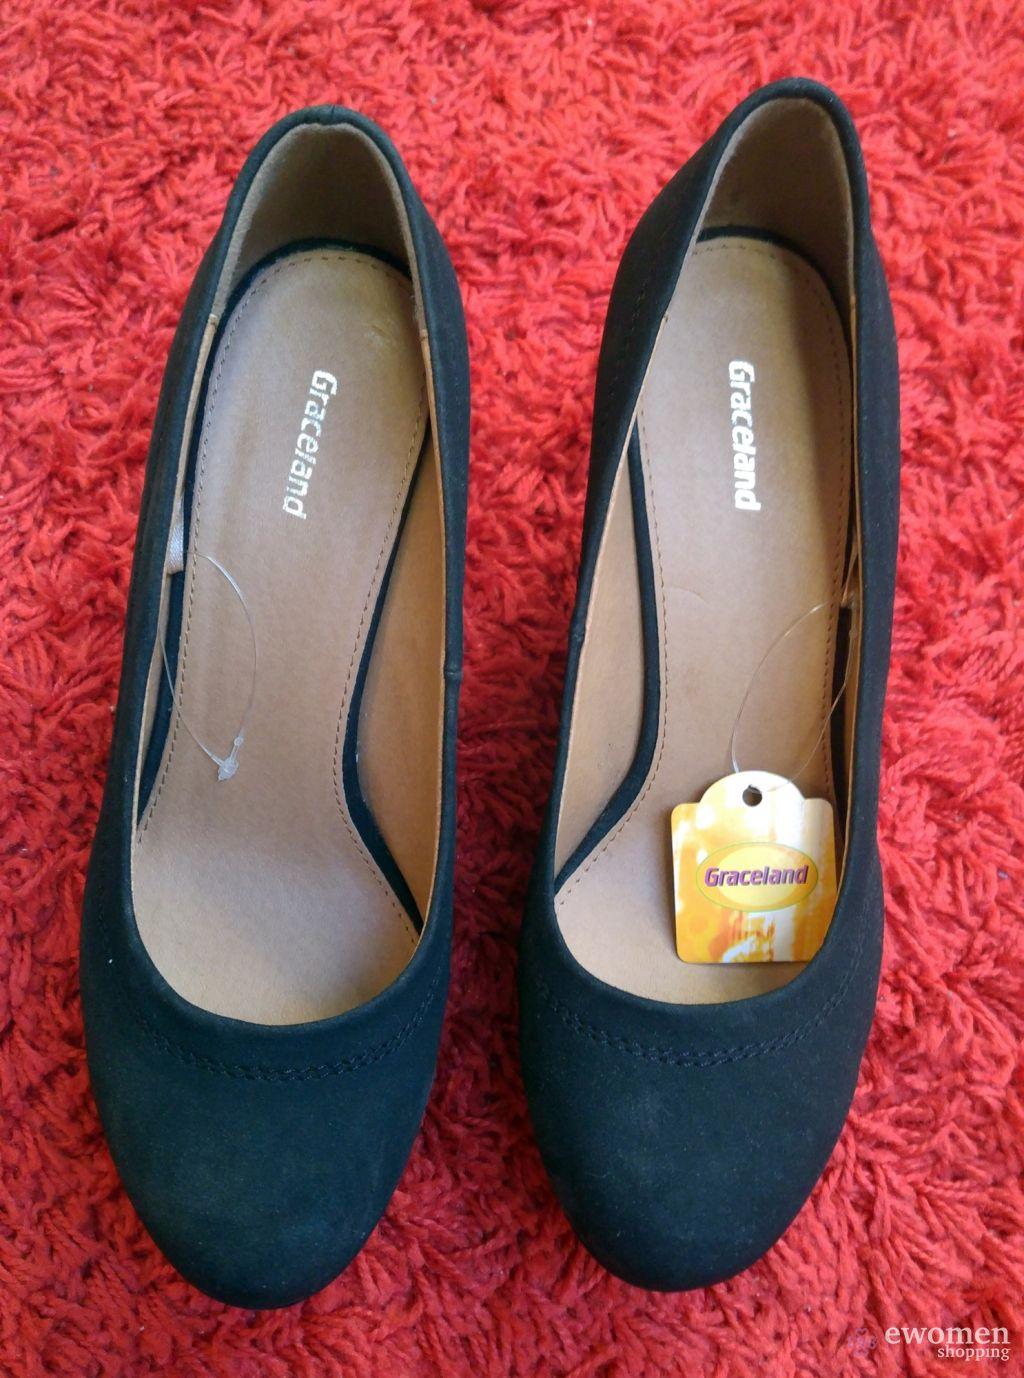 Fekete női cipő eWomen Shopping